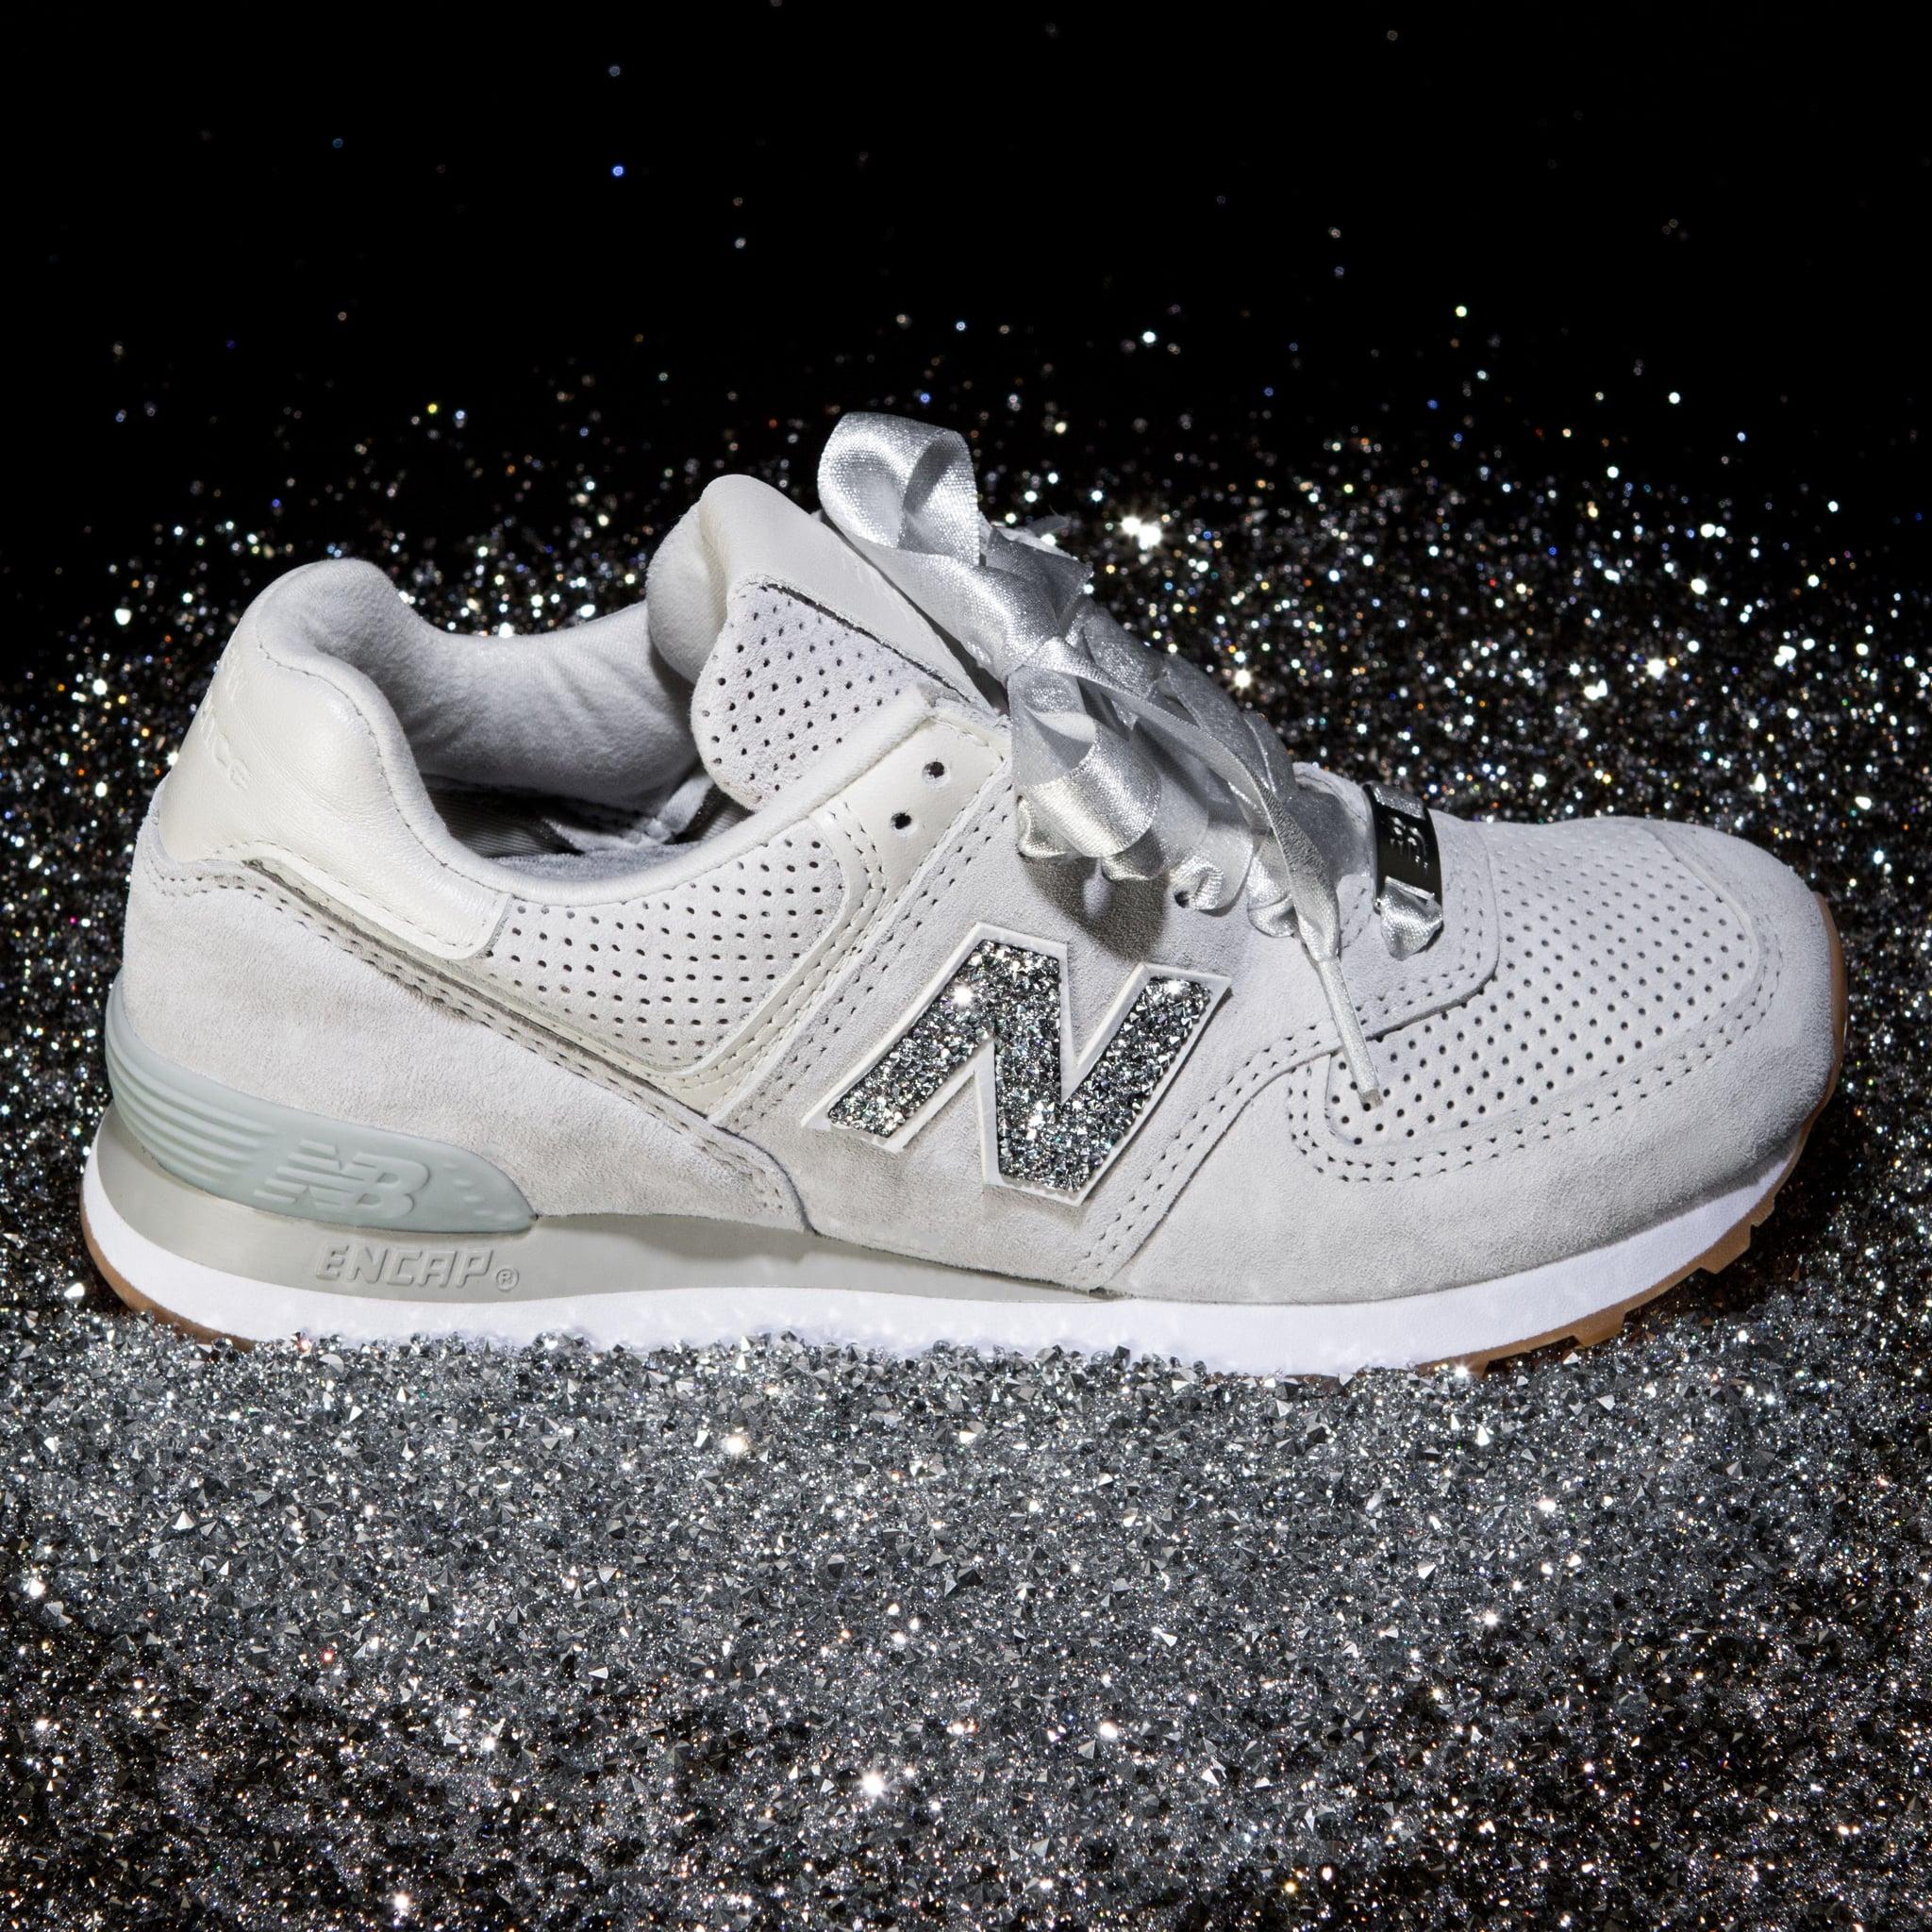 New Balance Swarovski Crystal Sneakers